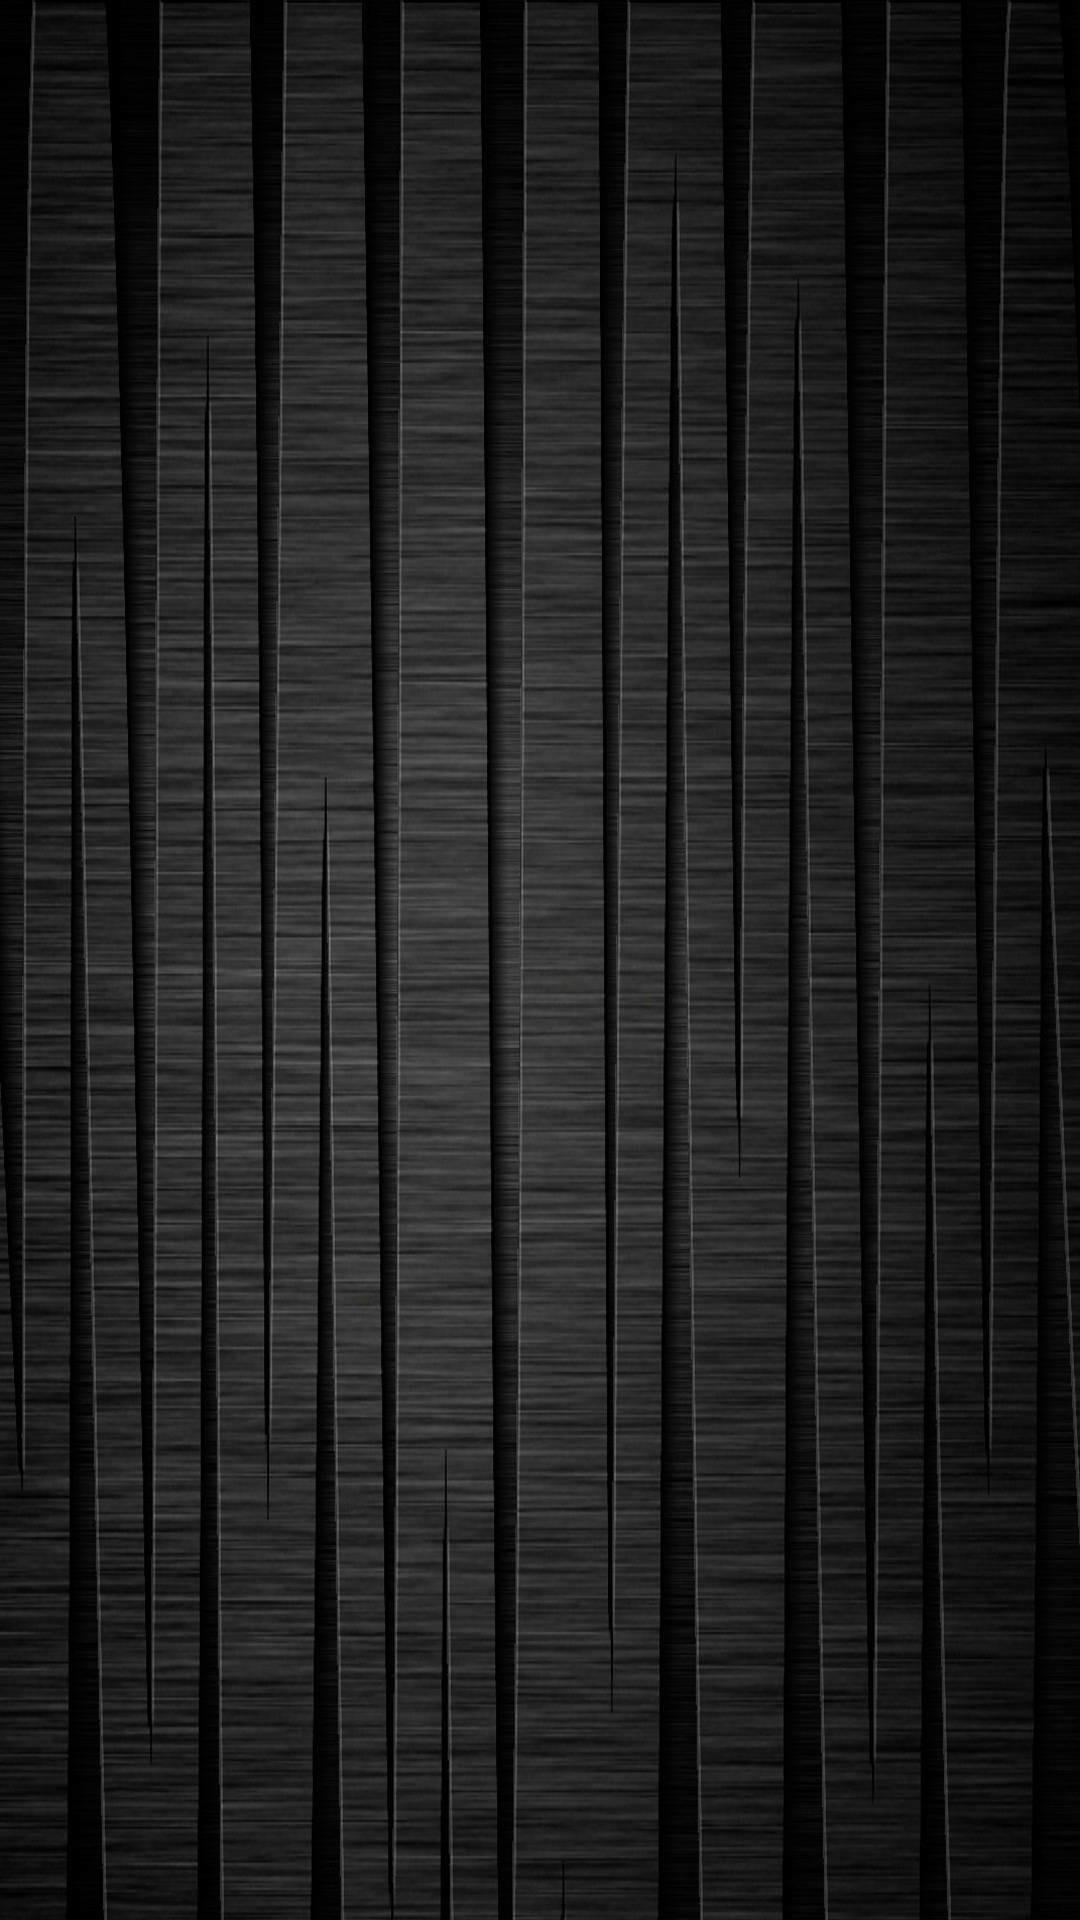 Download Vertical wood grain texture HD samsung galaxy s4 wallpaper